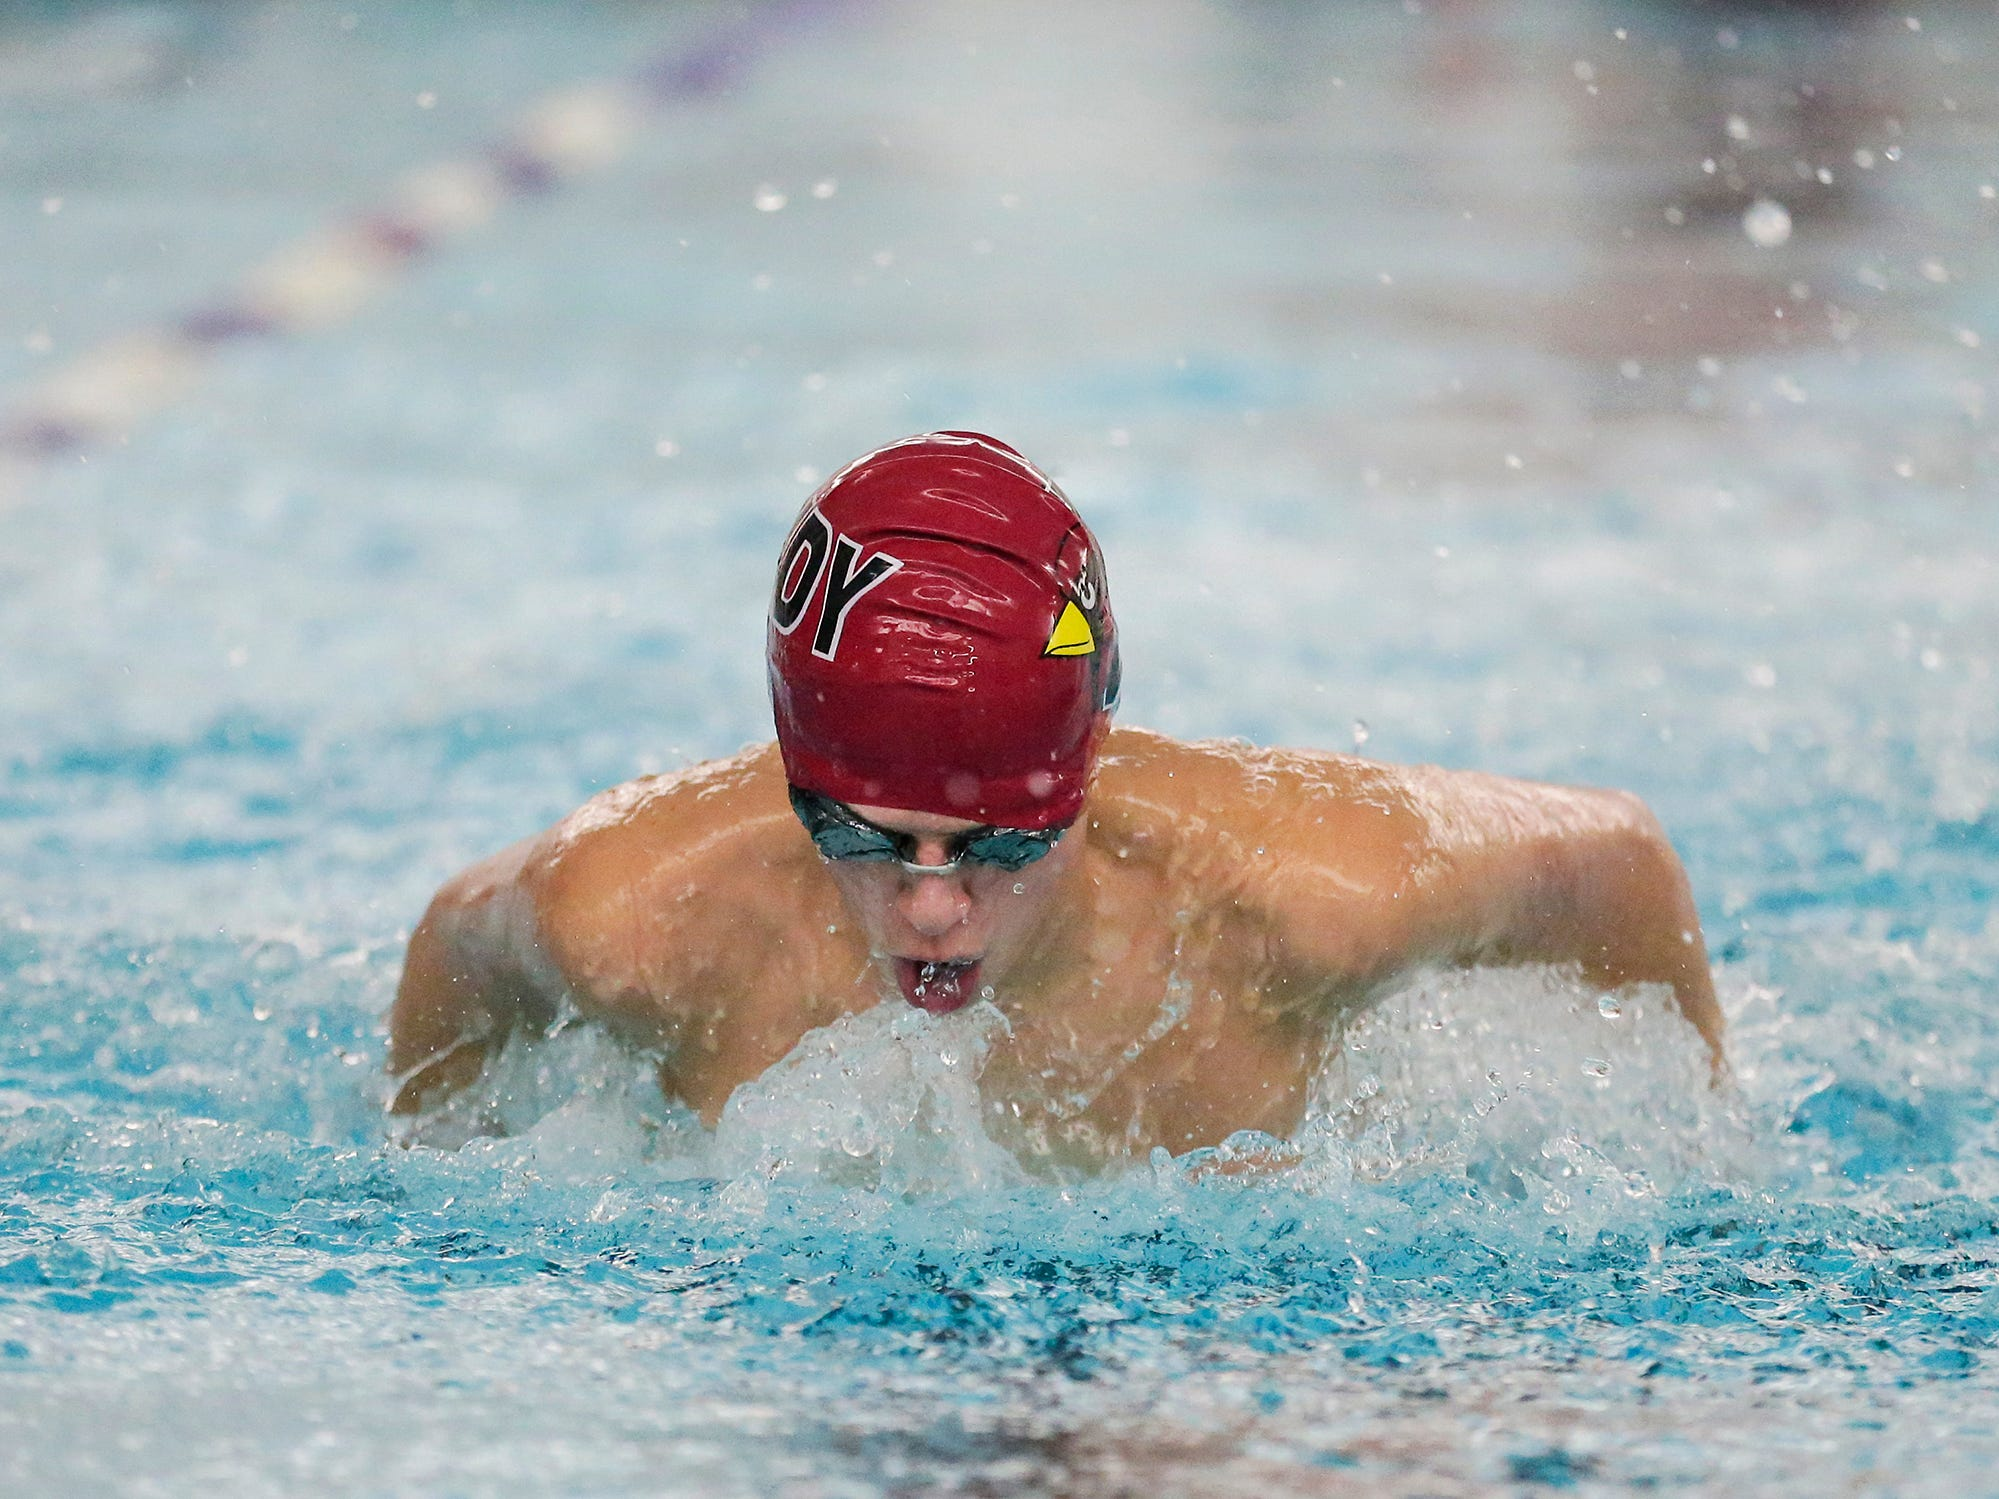 Fond du Lac High School's Jake Biermann competes in the 200 yard IM against Neenah High School during their swim meet Tuesday, December 11, 2018 in Fond du Lac, Wisconsin. Doug Raflik/USA TODAY NETWORK-Wisconsin